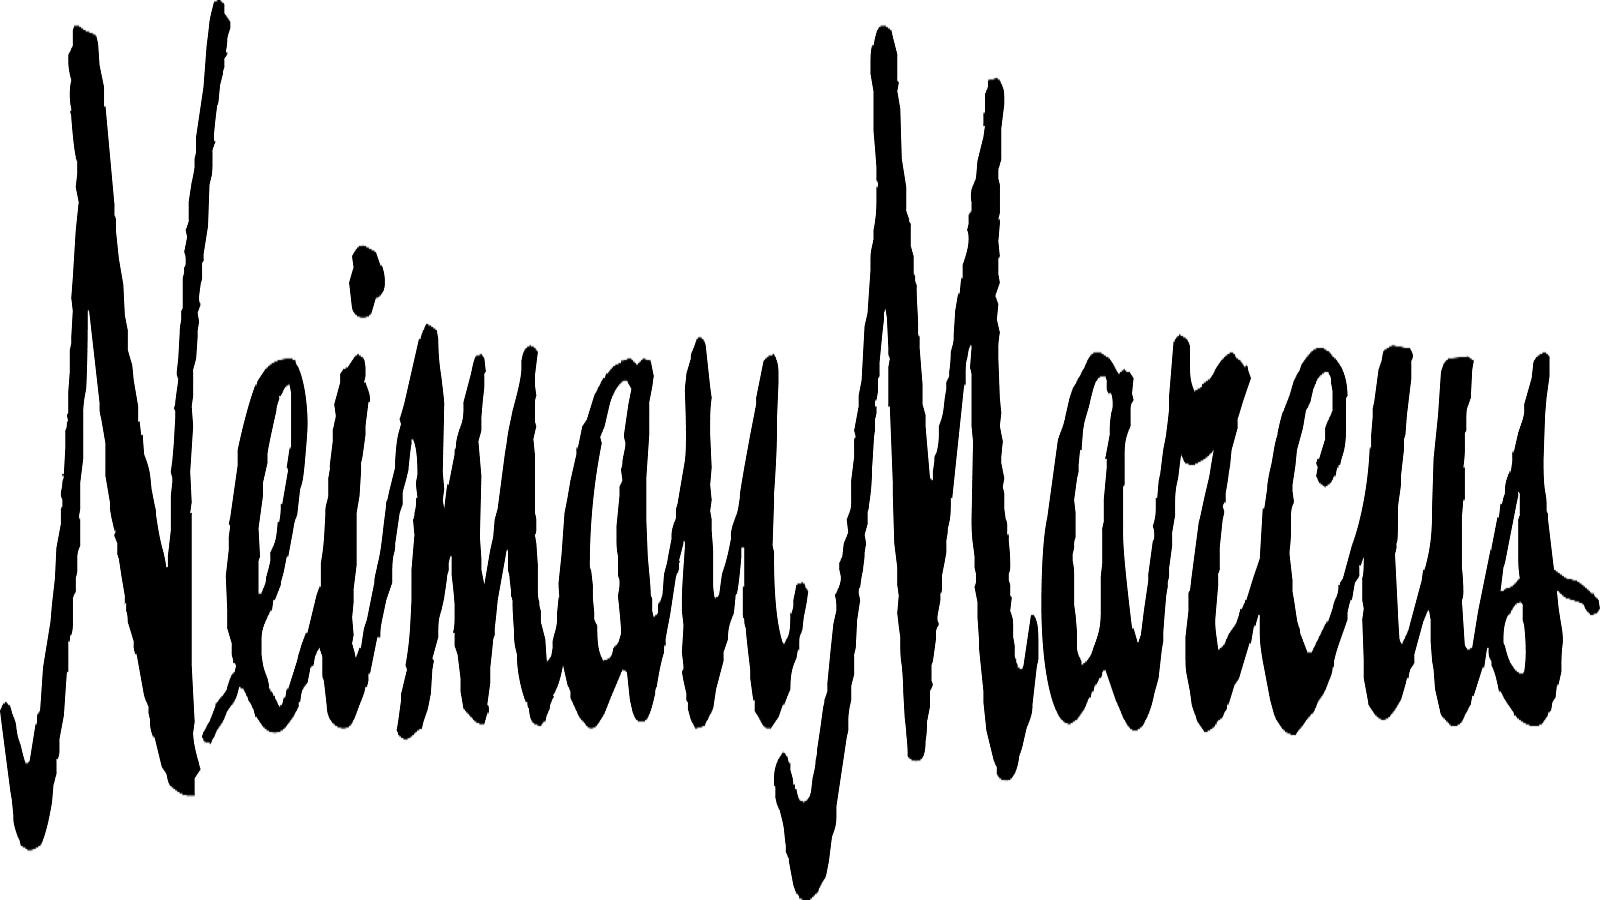 Neiman Marcus Retail Personalization Score.